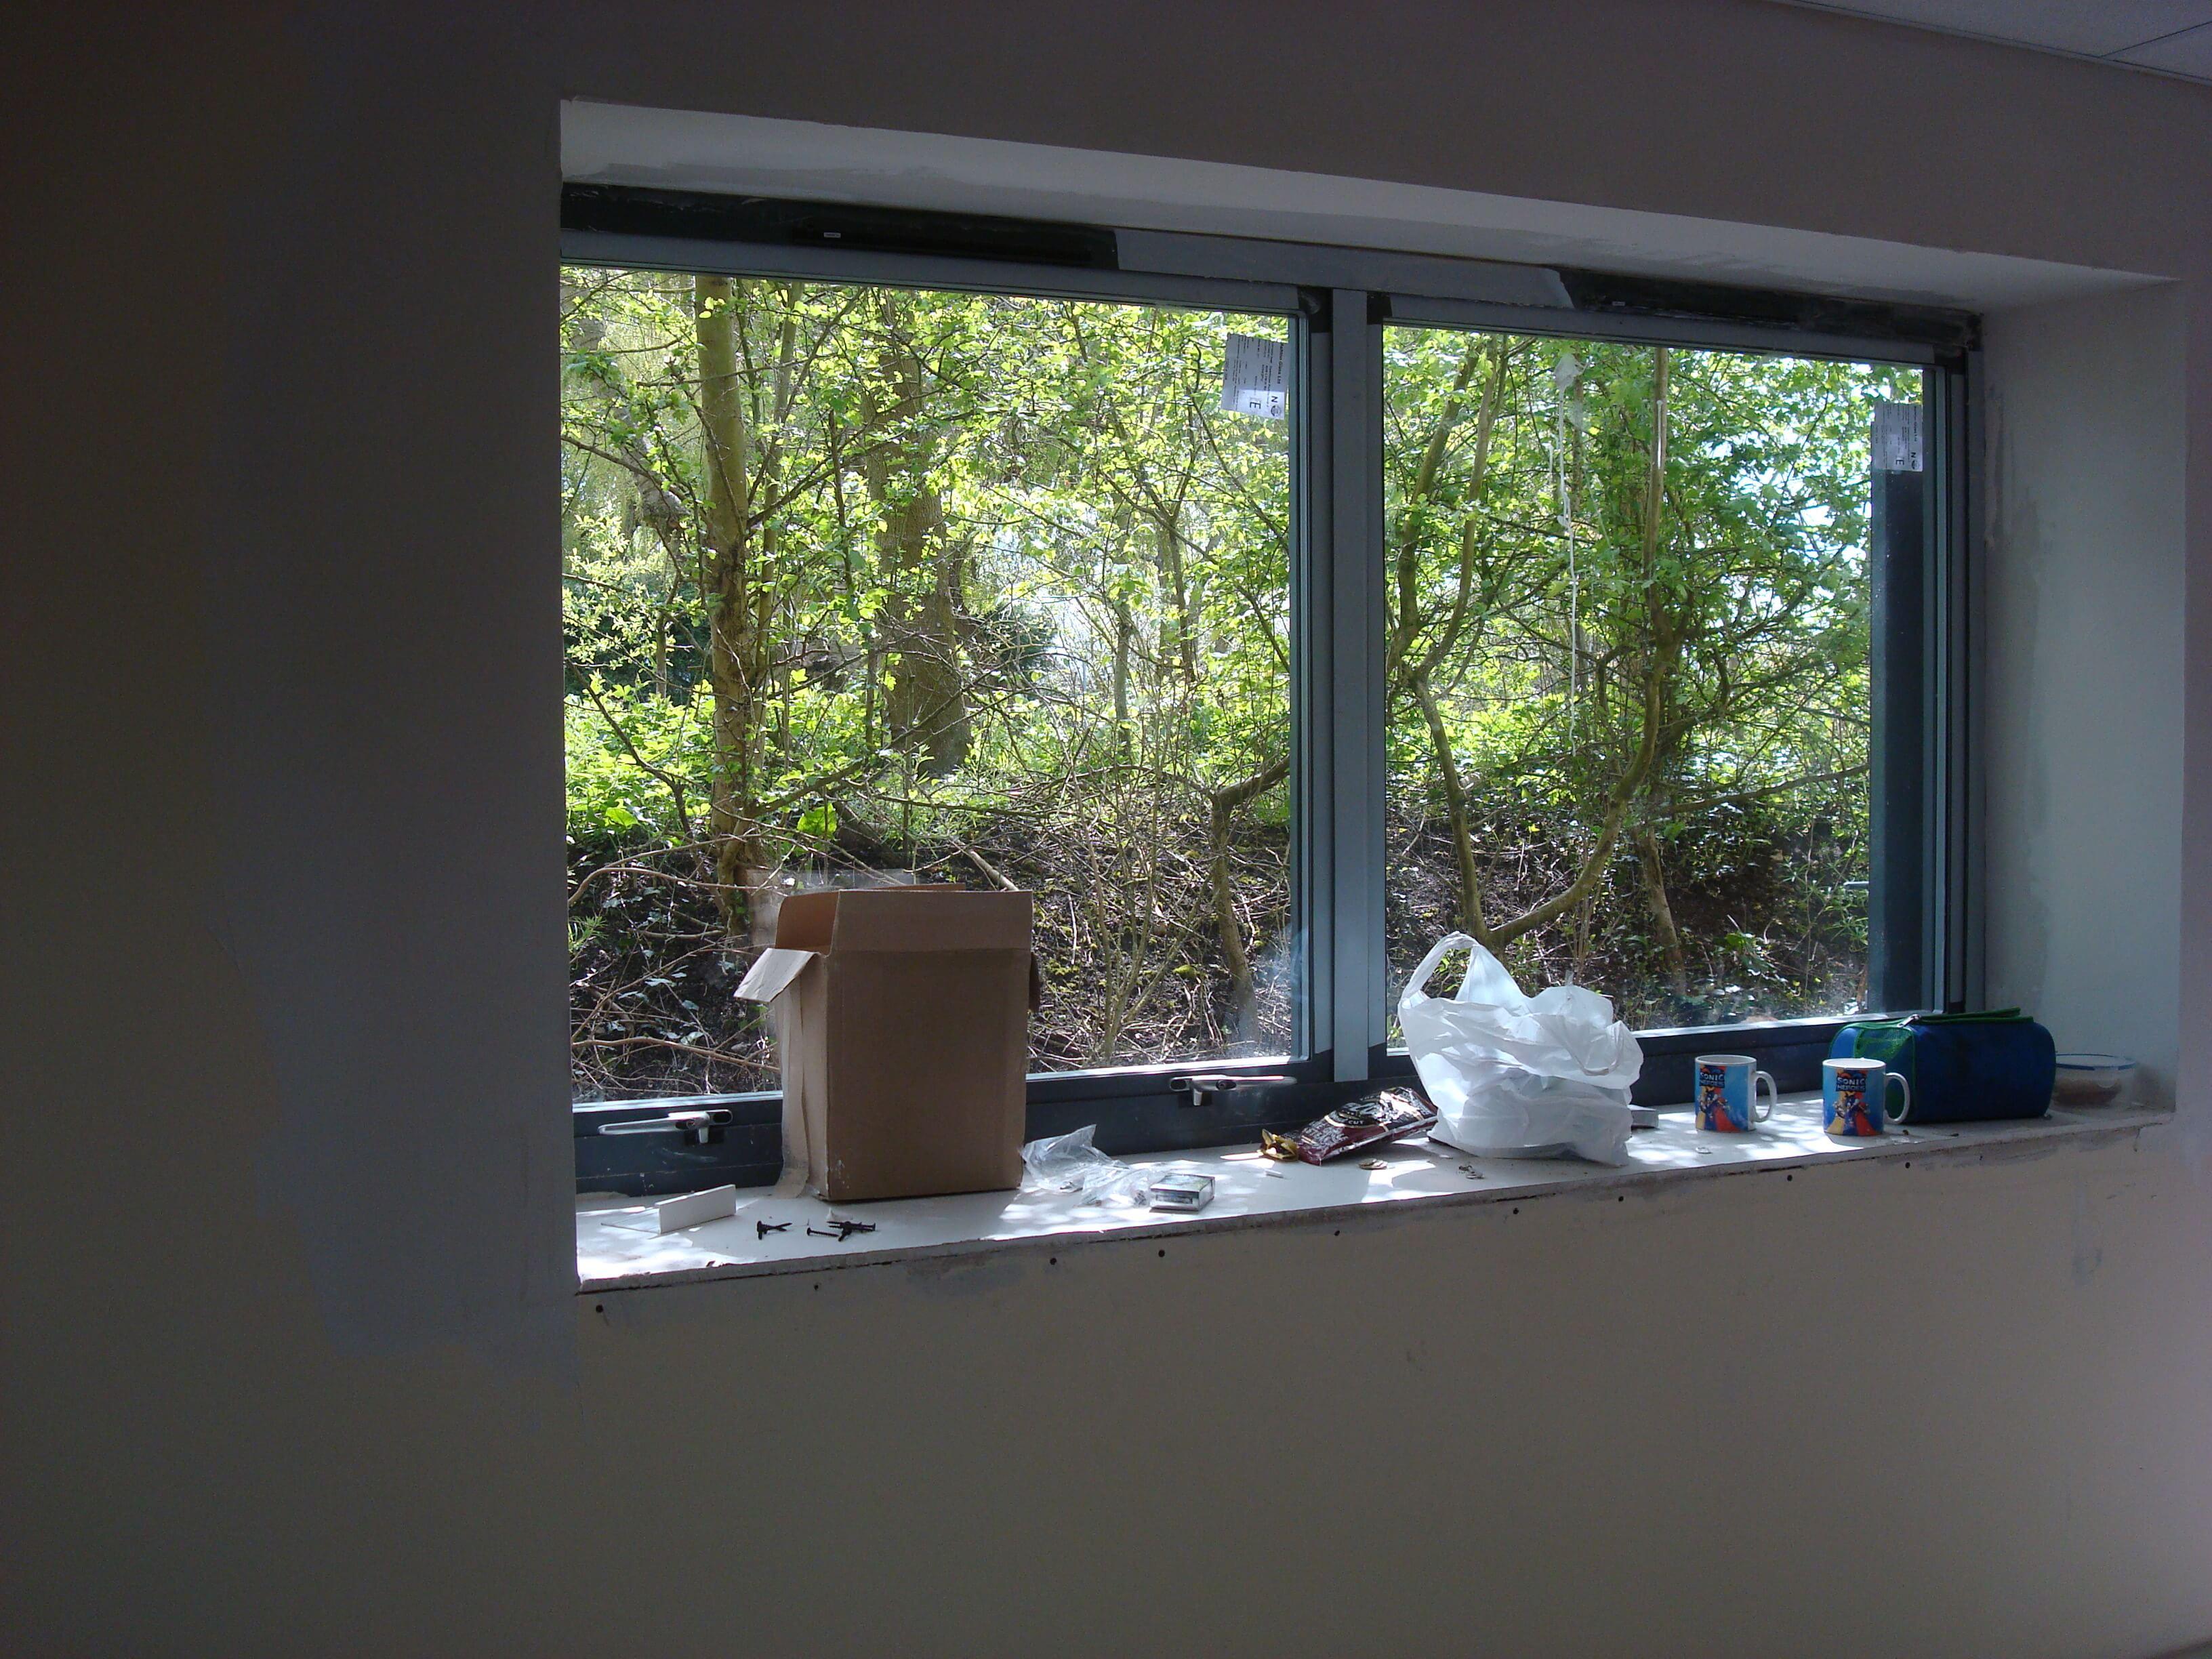 New windows downstairs